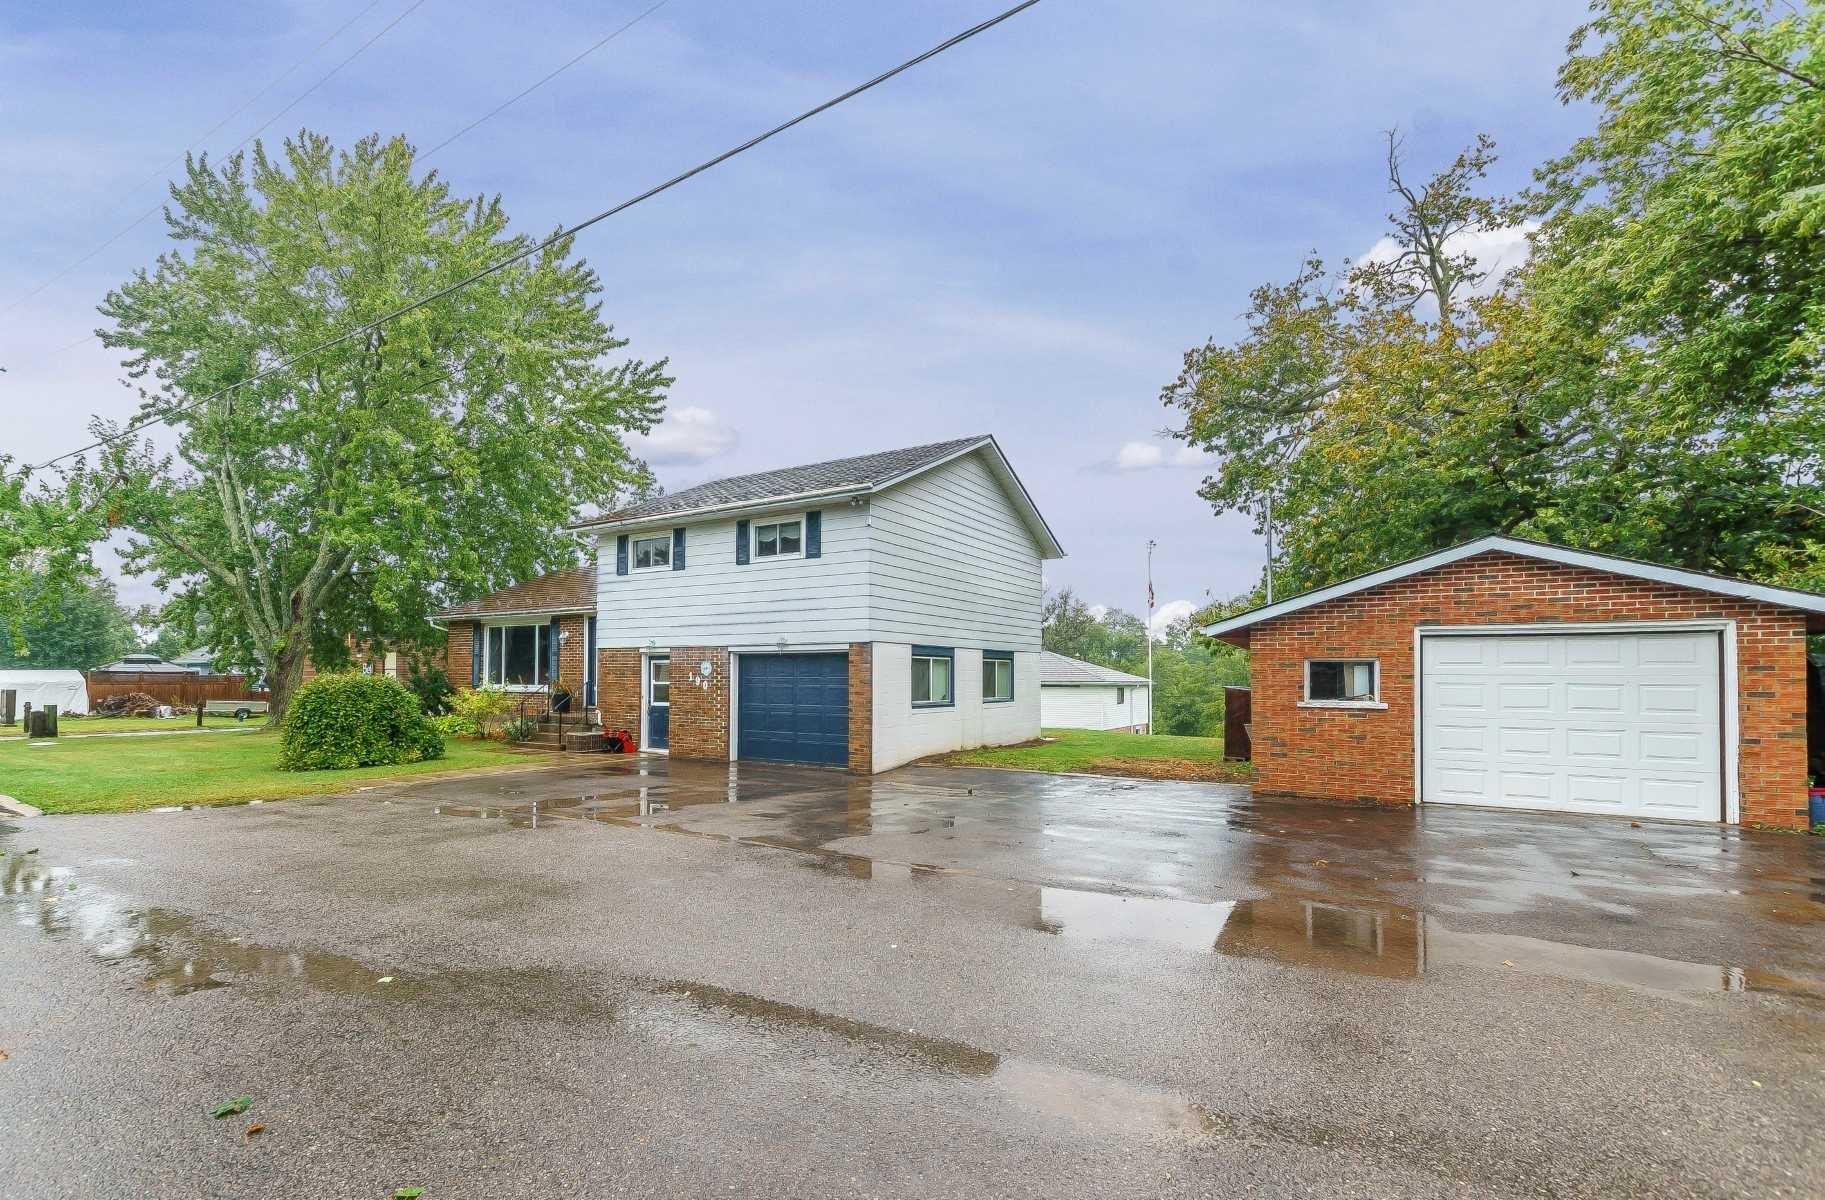 Photo 20: Photos: 190 N Church Street in Clarington: Orono House (Sidesplit 4) for sale : MLS®# E4463047